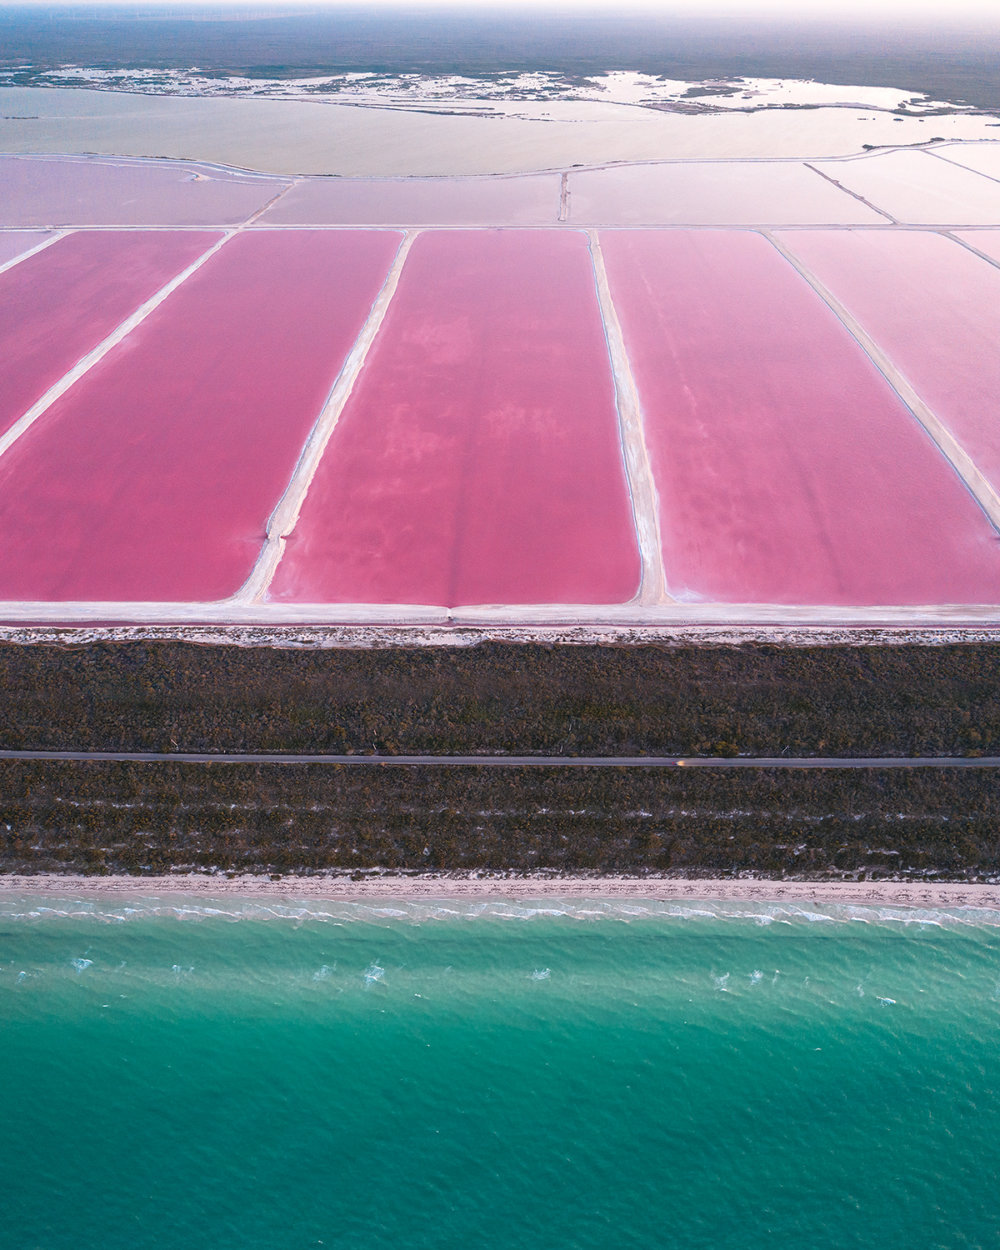 Mexico From Above Aerial Photography Series By Dimitar Karanikolov 6